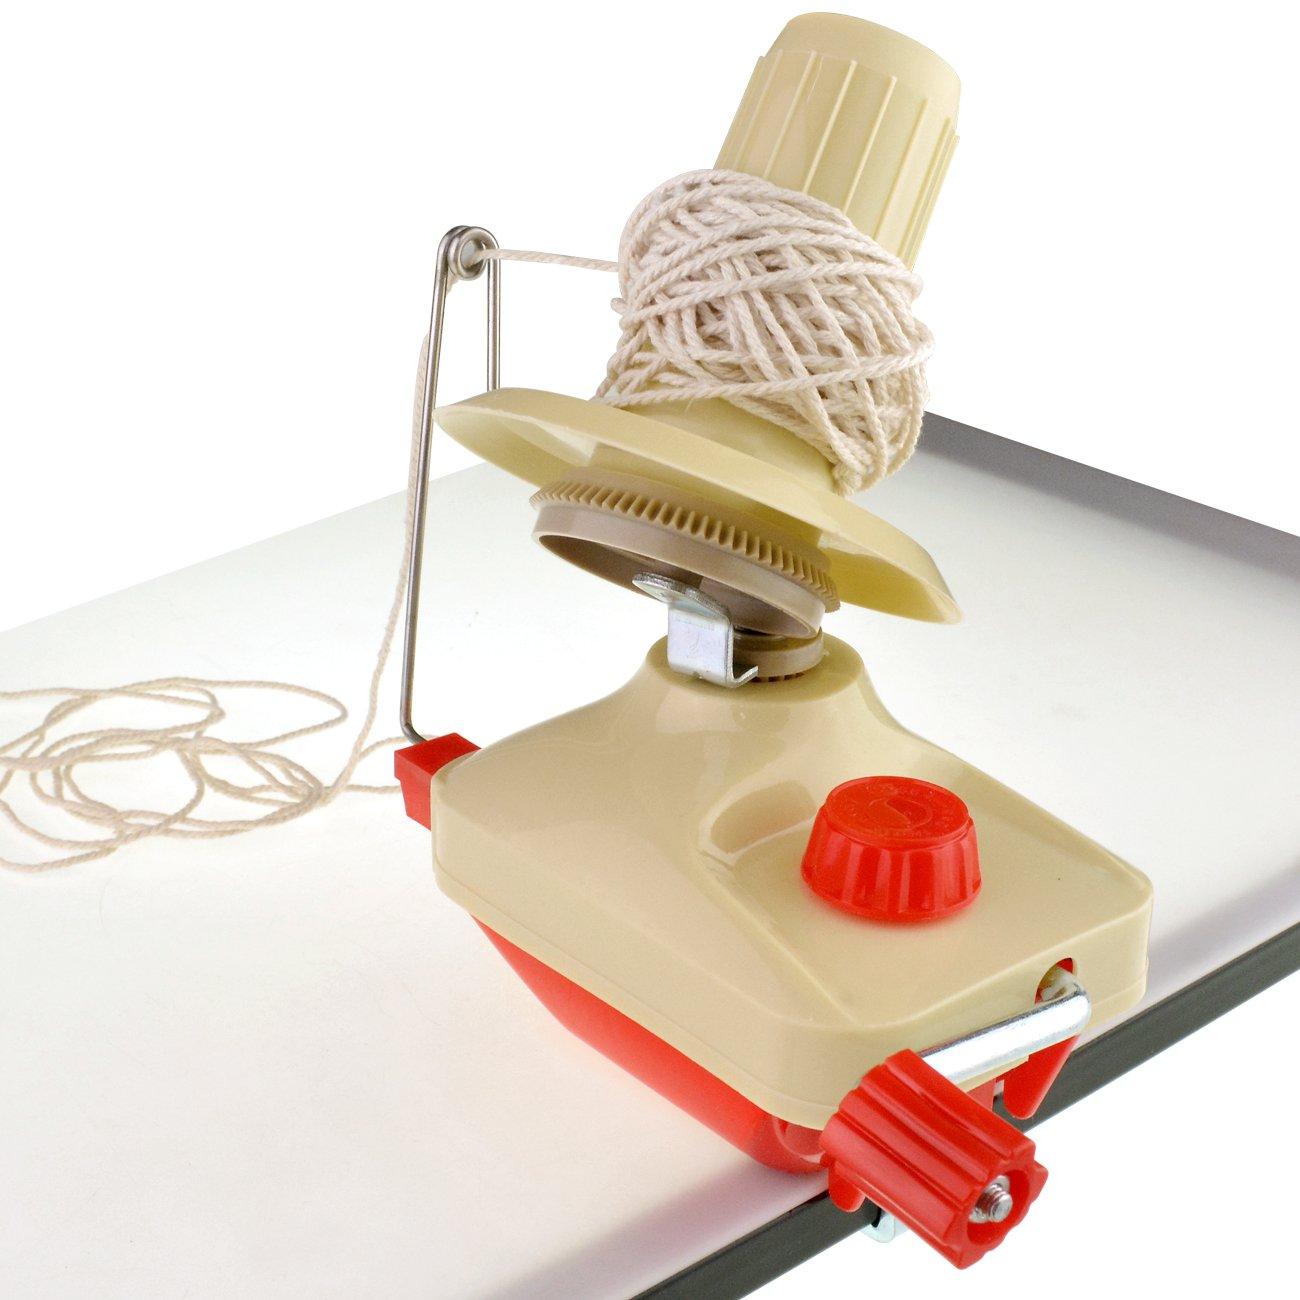 Monkeybrother Thread Skein Ball Tidy Machine Hand Operated Wool Winder Holder for Swift Yarn Fiber String Ball HM4031 same